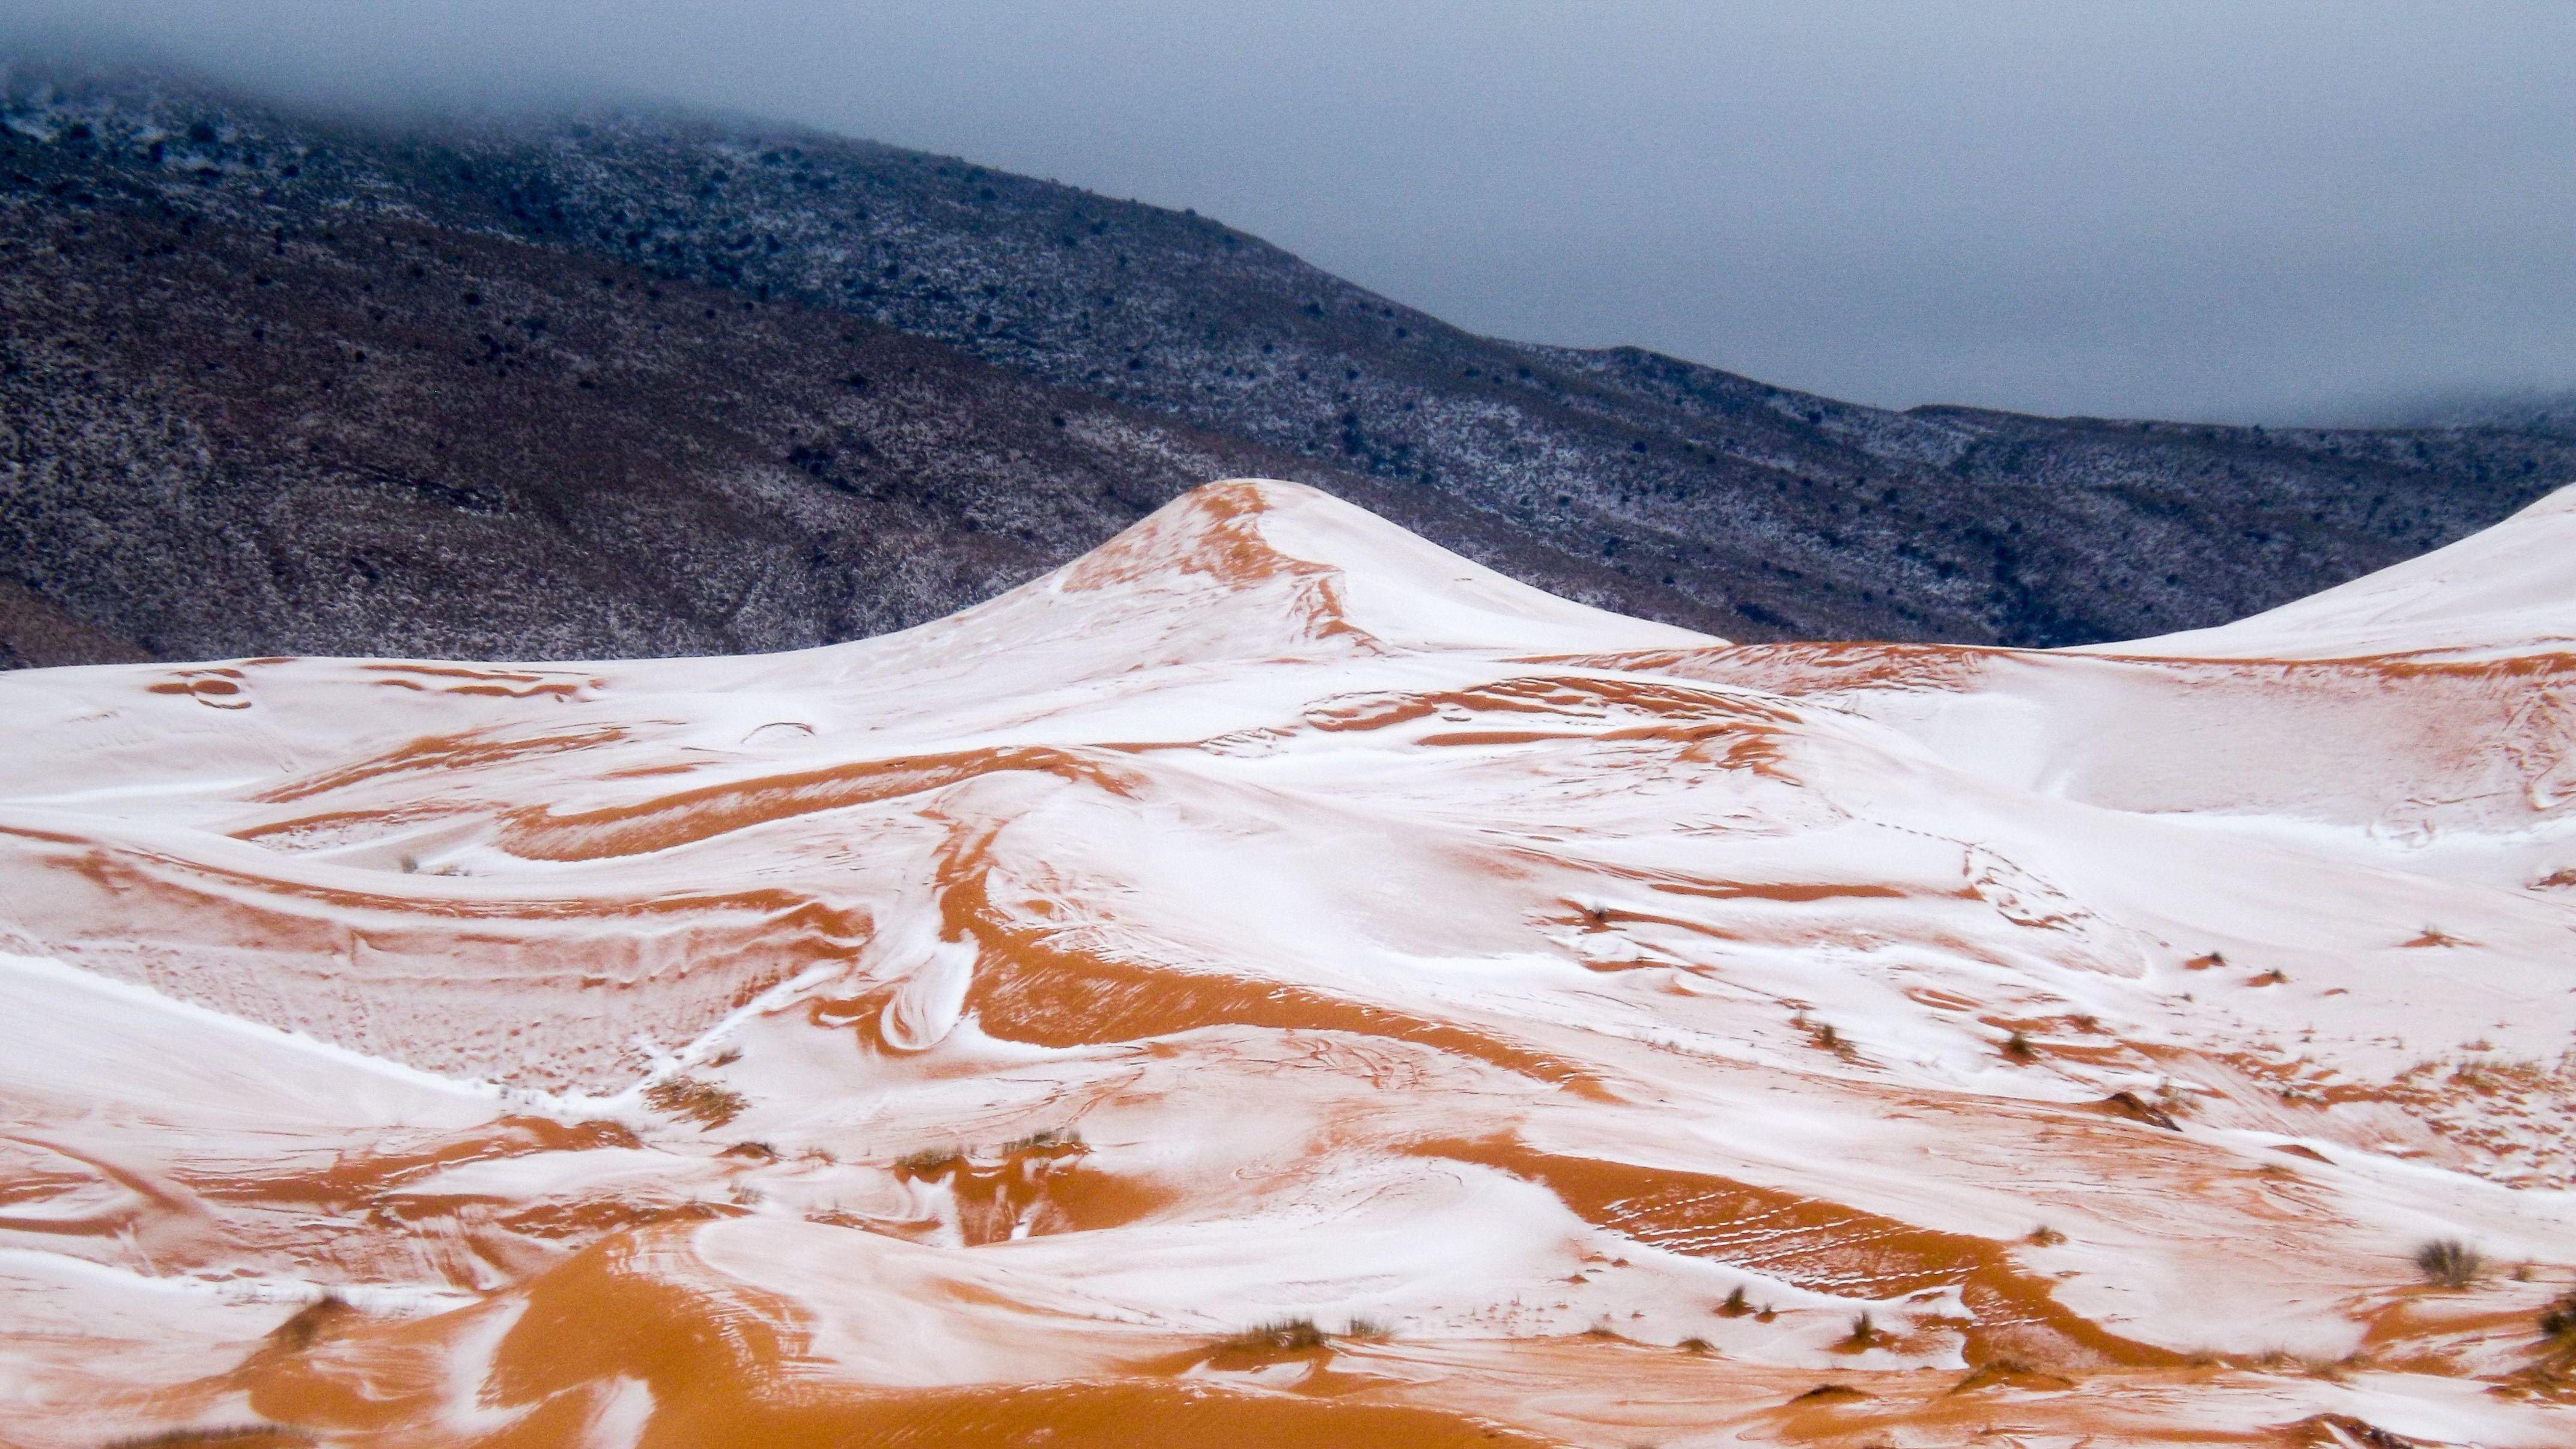 Rare Snowfall Blankets Dunes in The Sahara